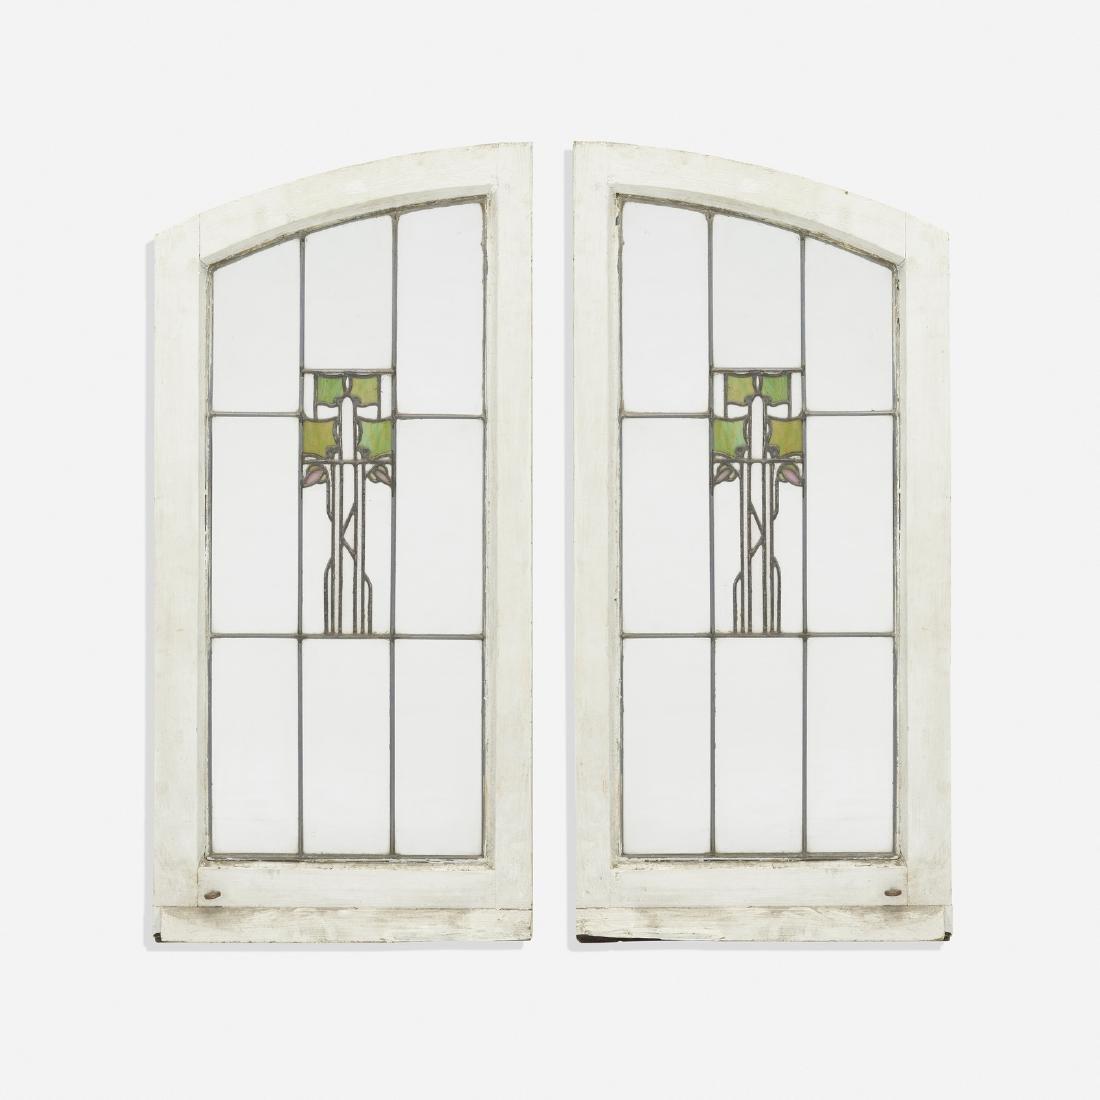 George Washington Maher, pair of windows